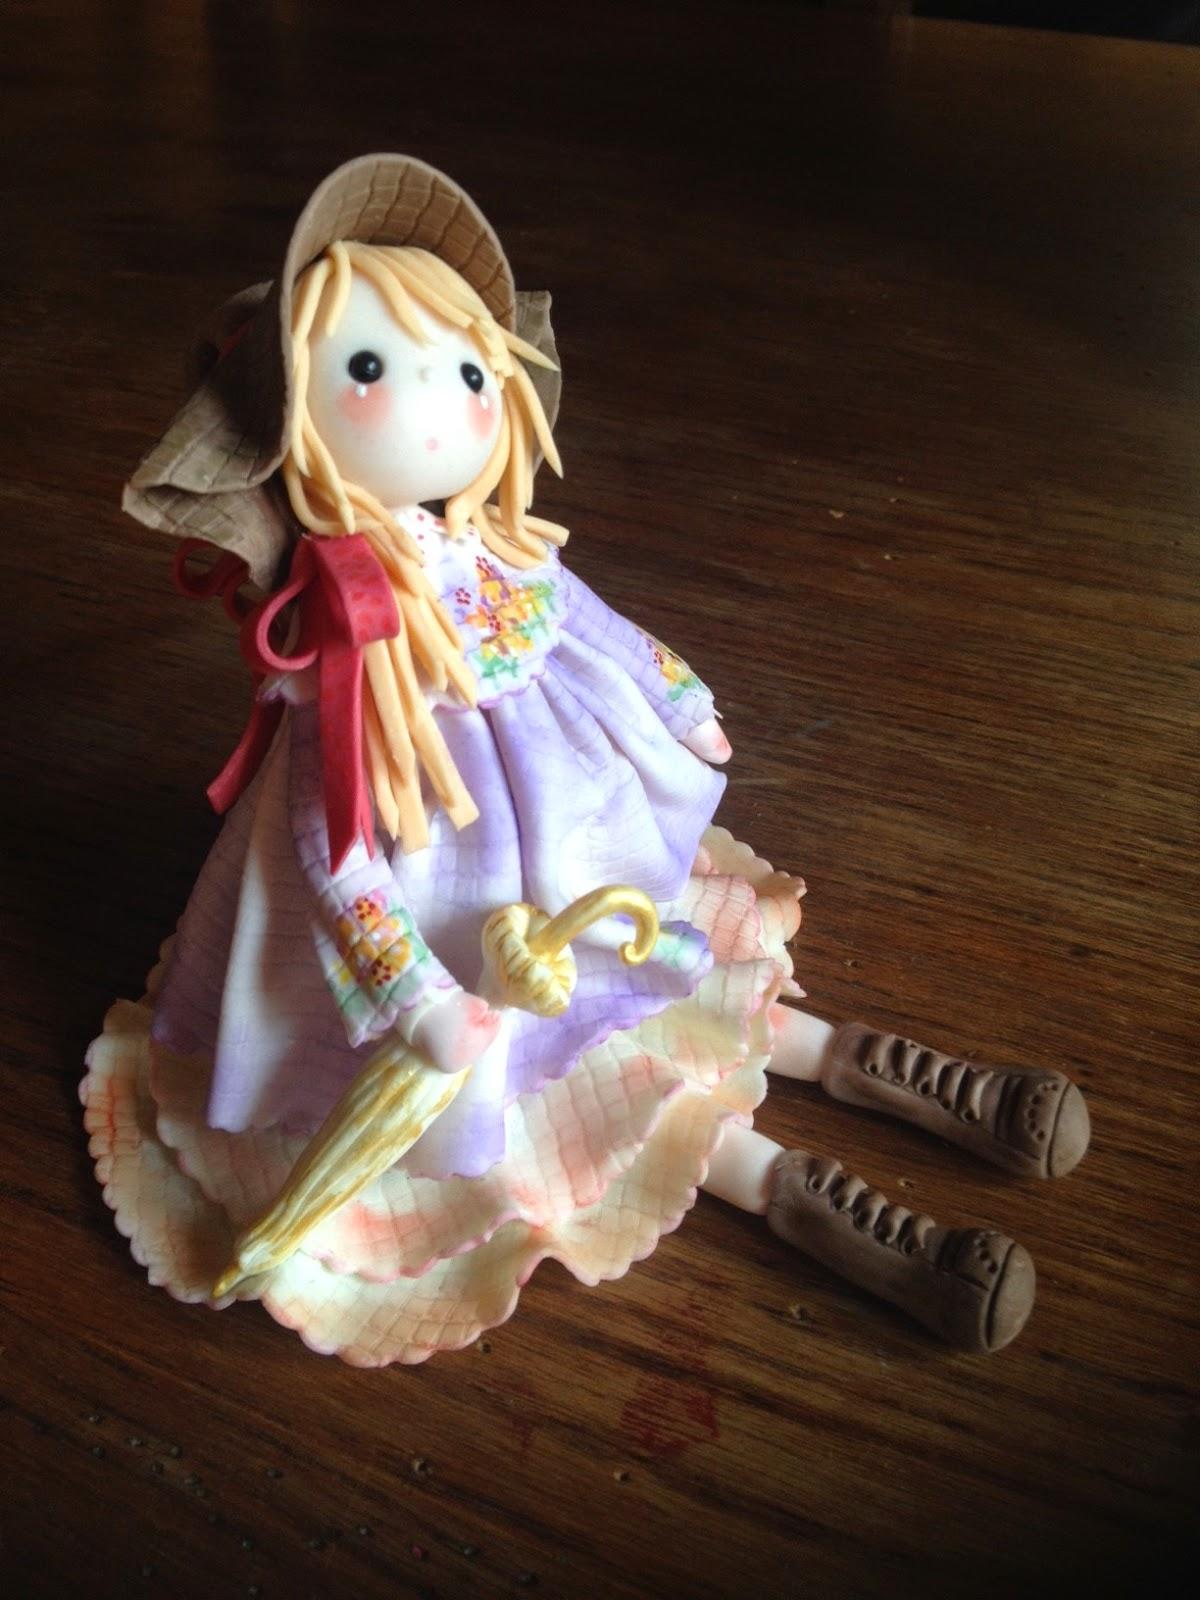 bambola porcellana fredda